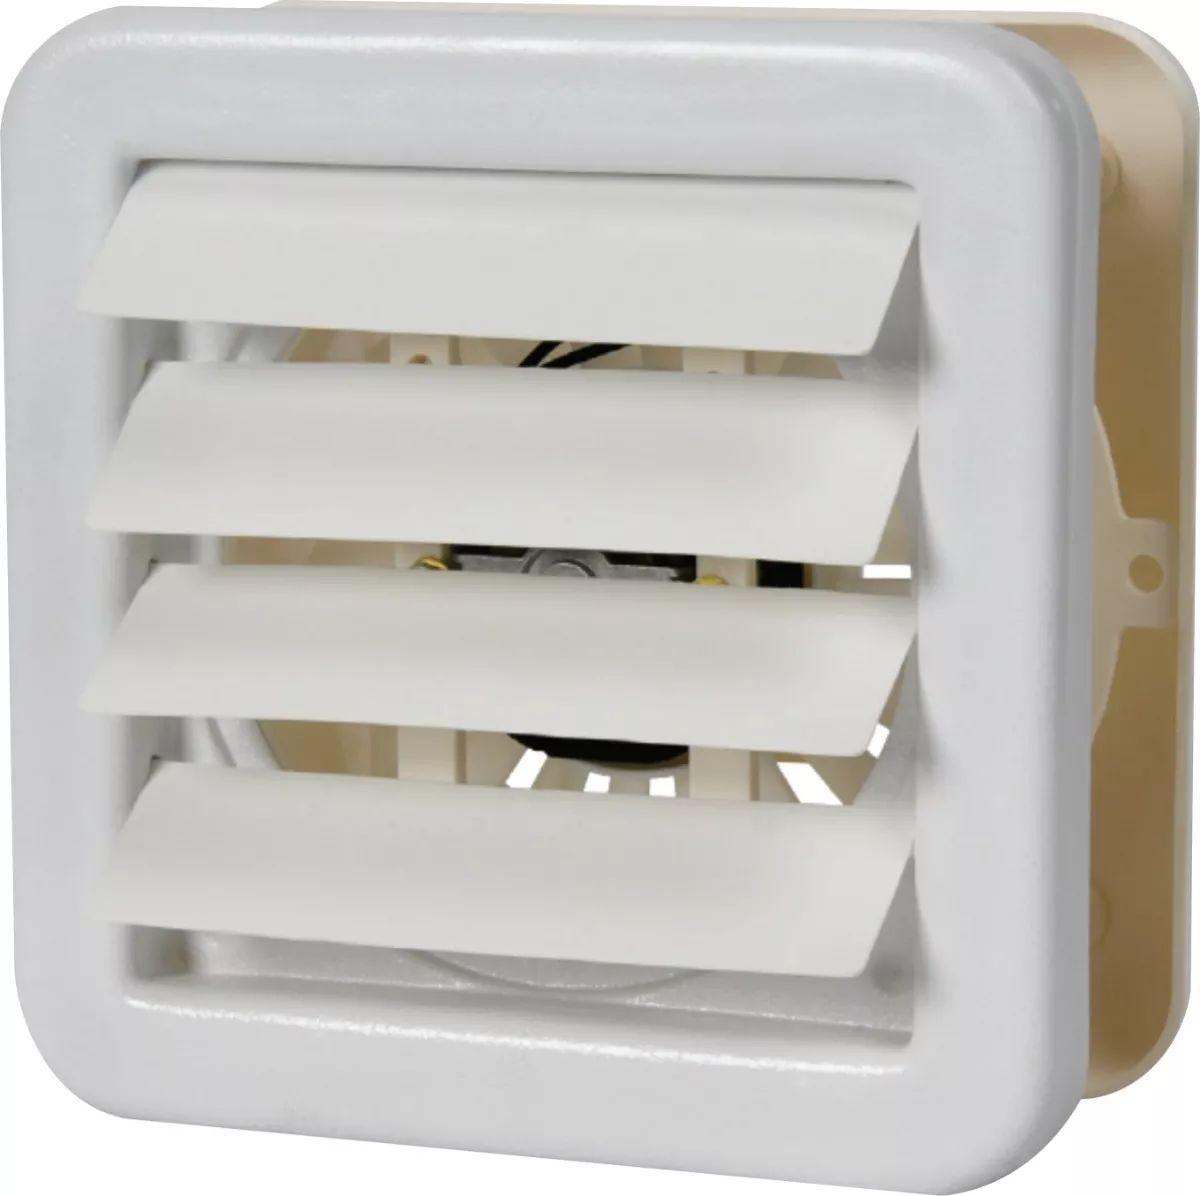 Exaustor Depurador de Ar ITC Brisa 12,6cm Safanelli Branco